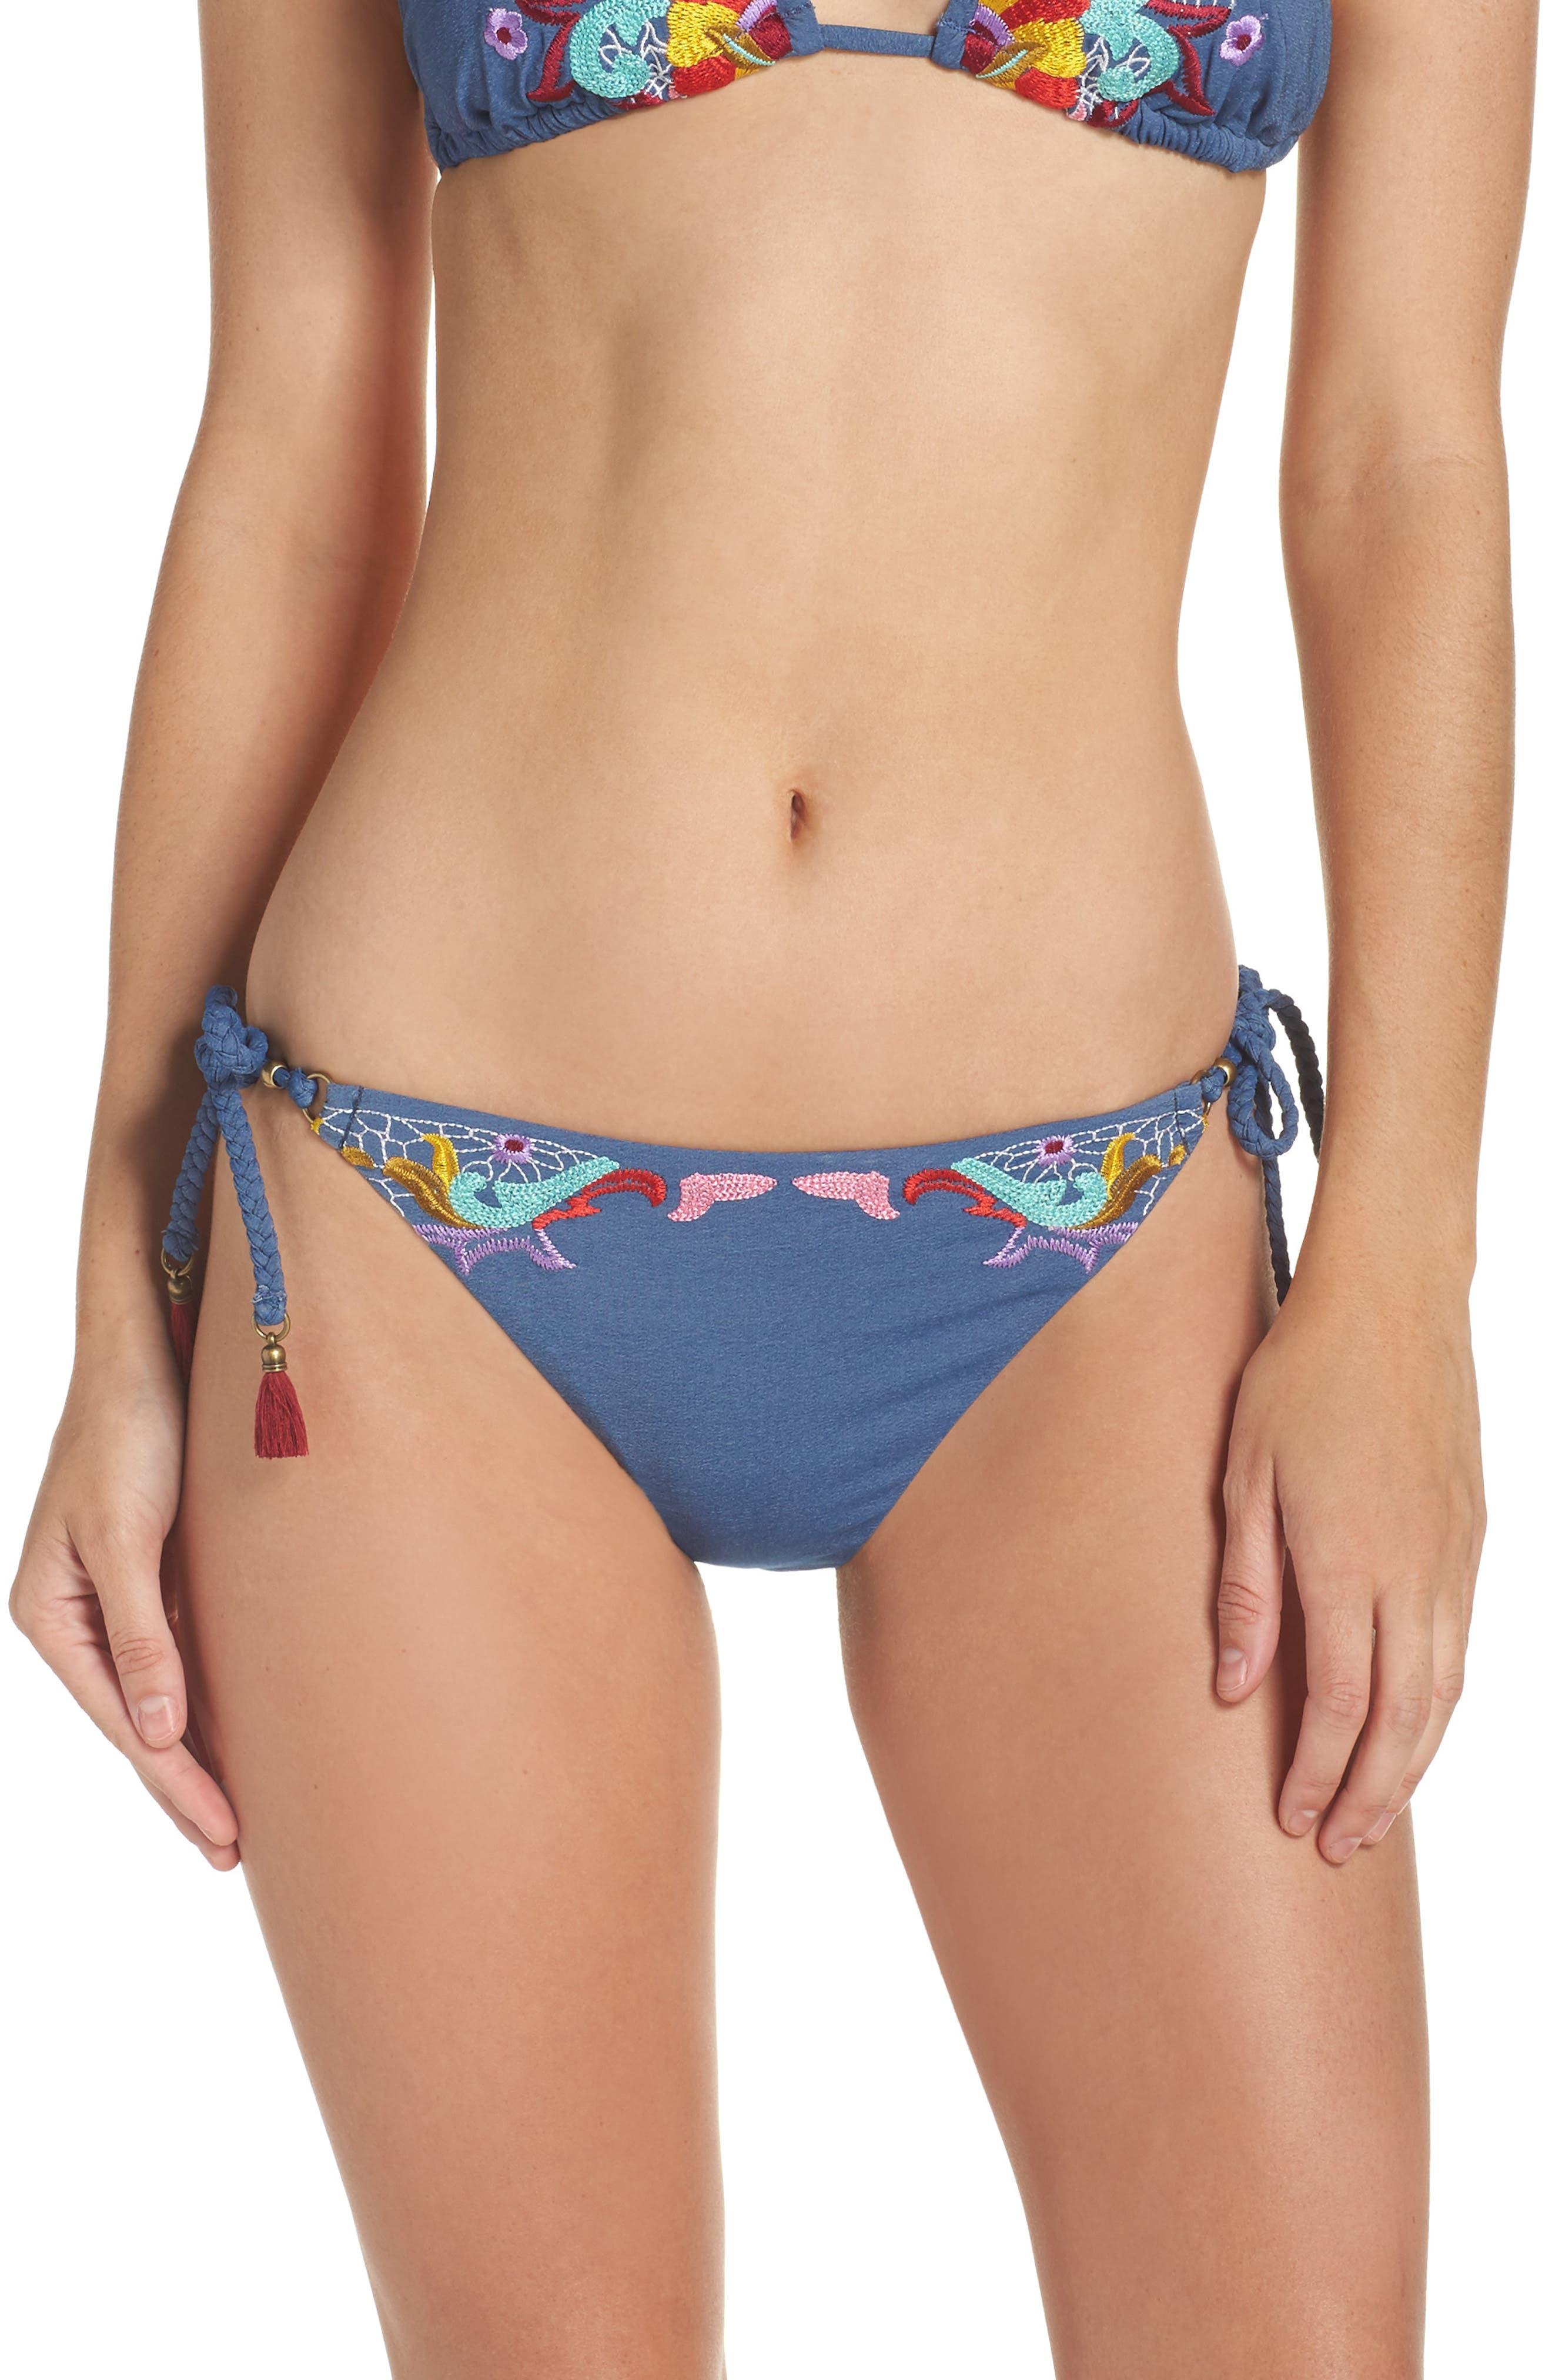 Dazed Denim Vamp Side Tie Bikini Bottoms,                             Main thumbnail 1, color,                             400